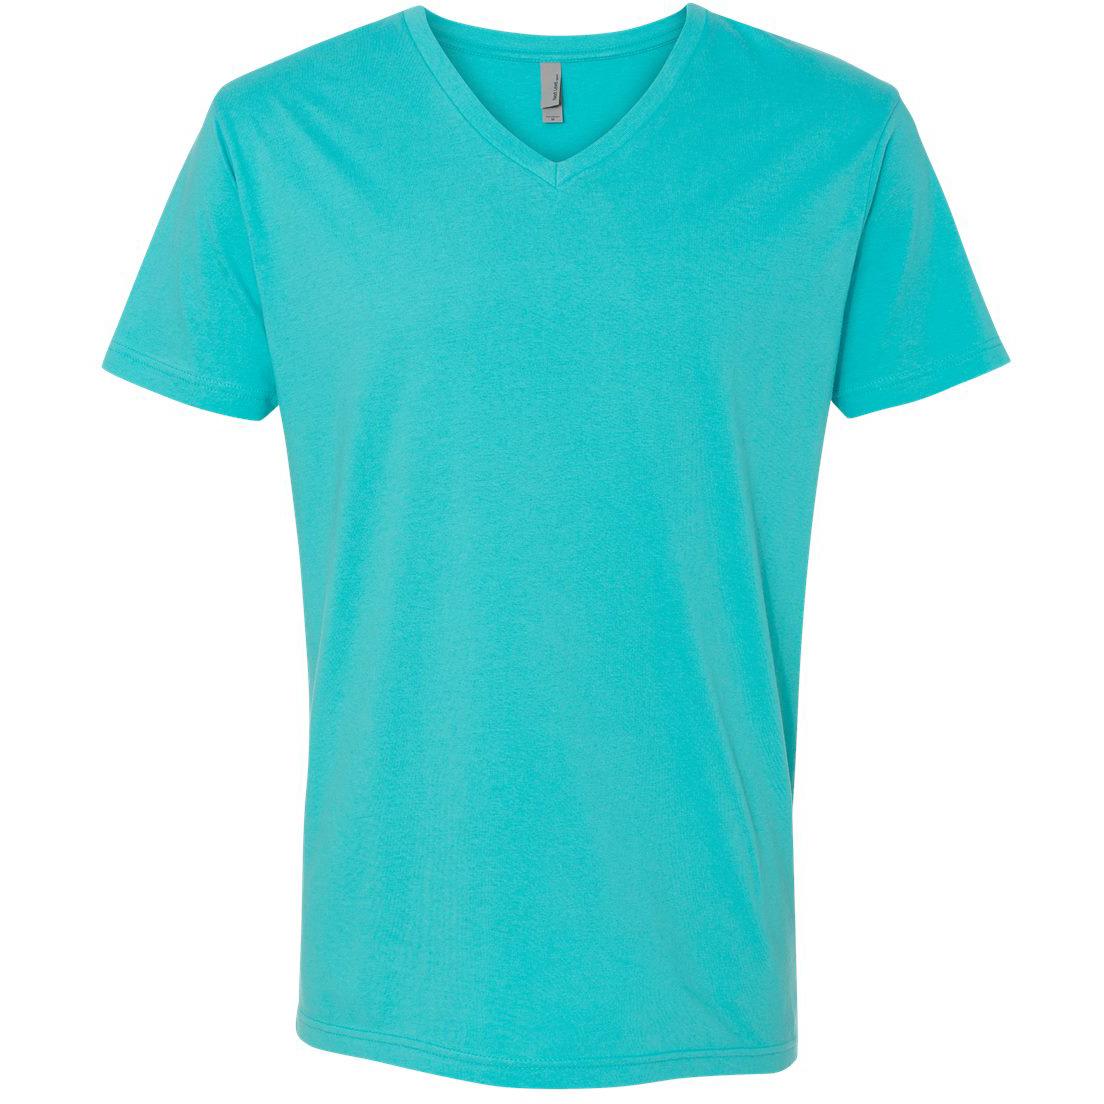 Next level 3200 premium short sleeve v tahiti blue for T shirt design v neck